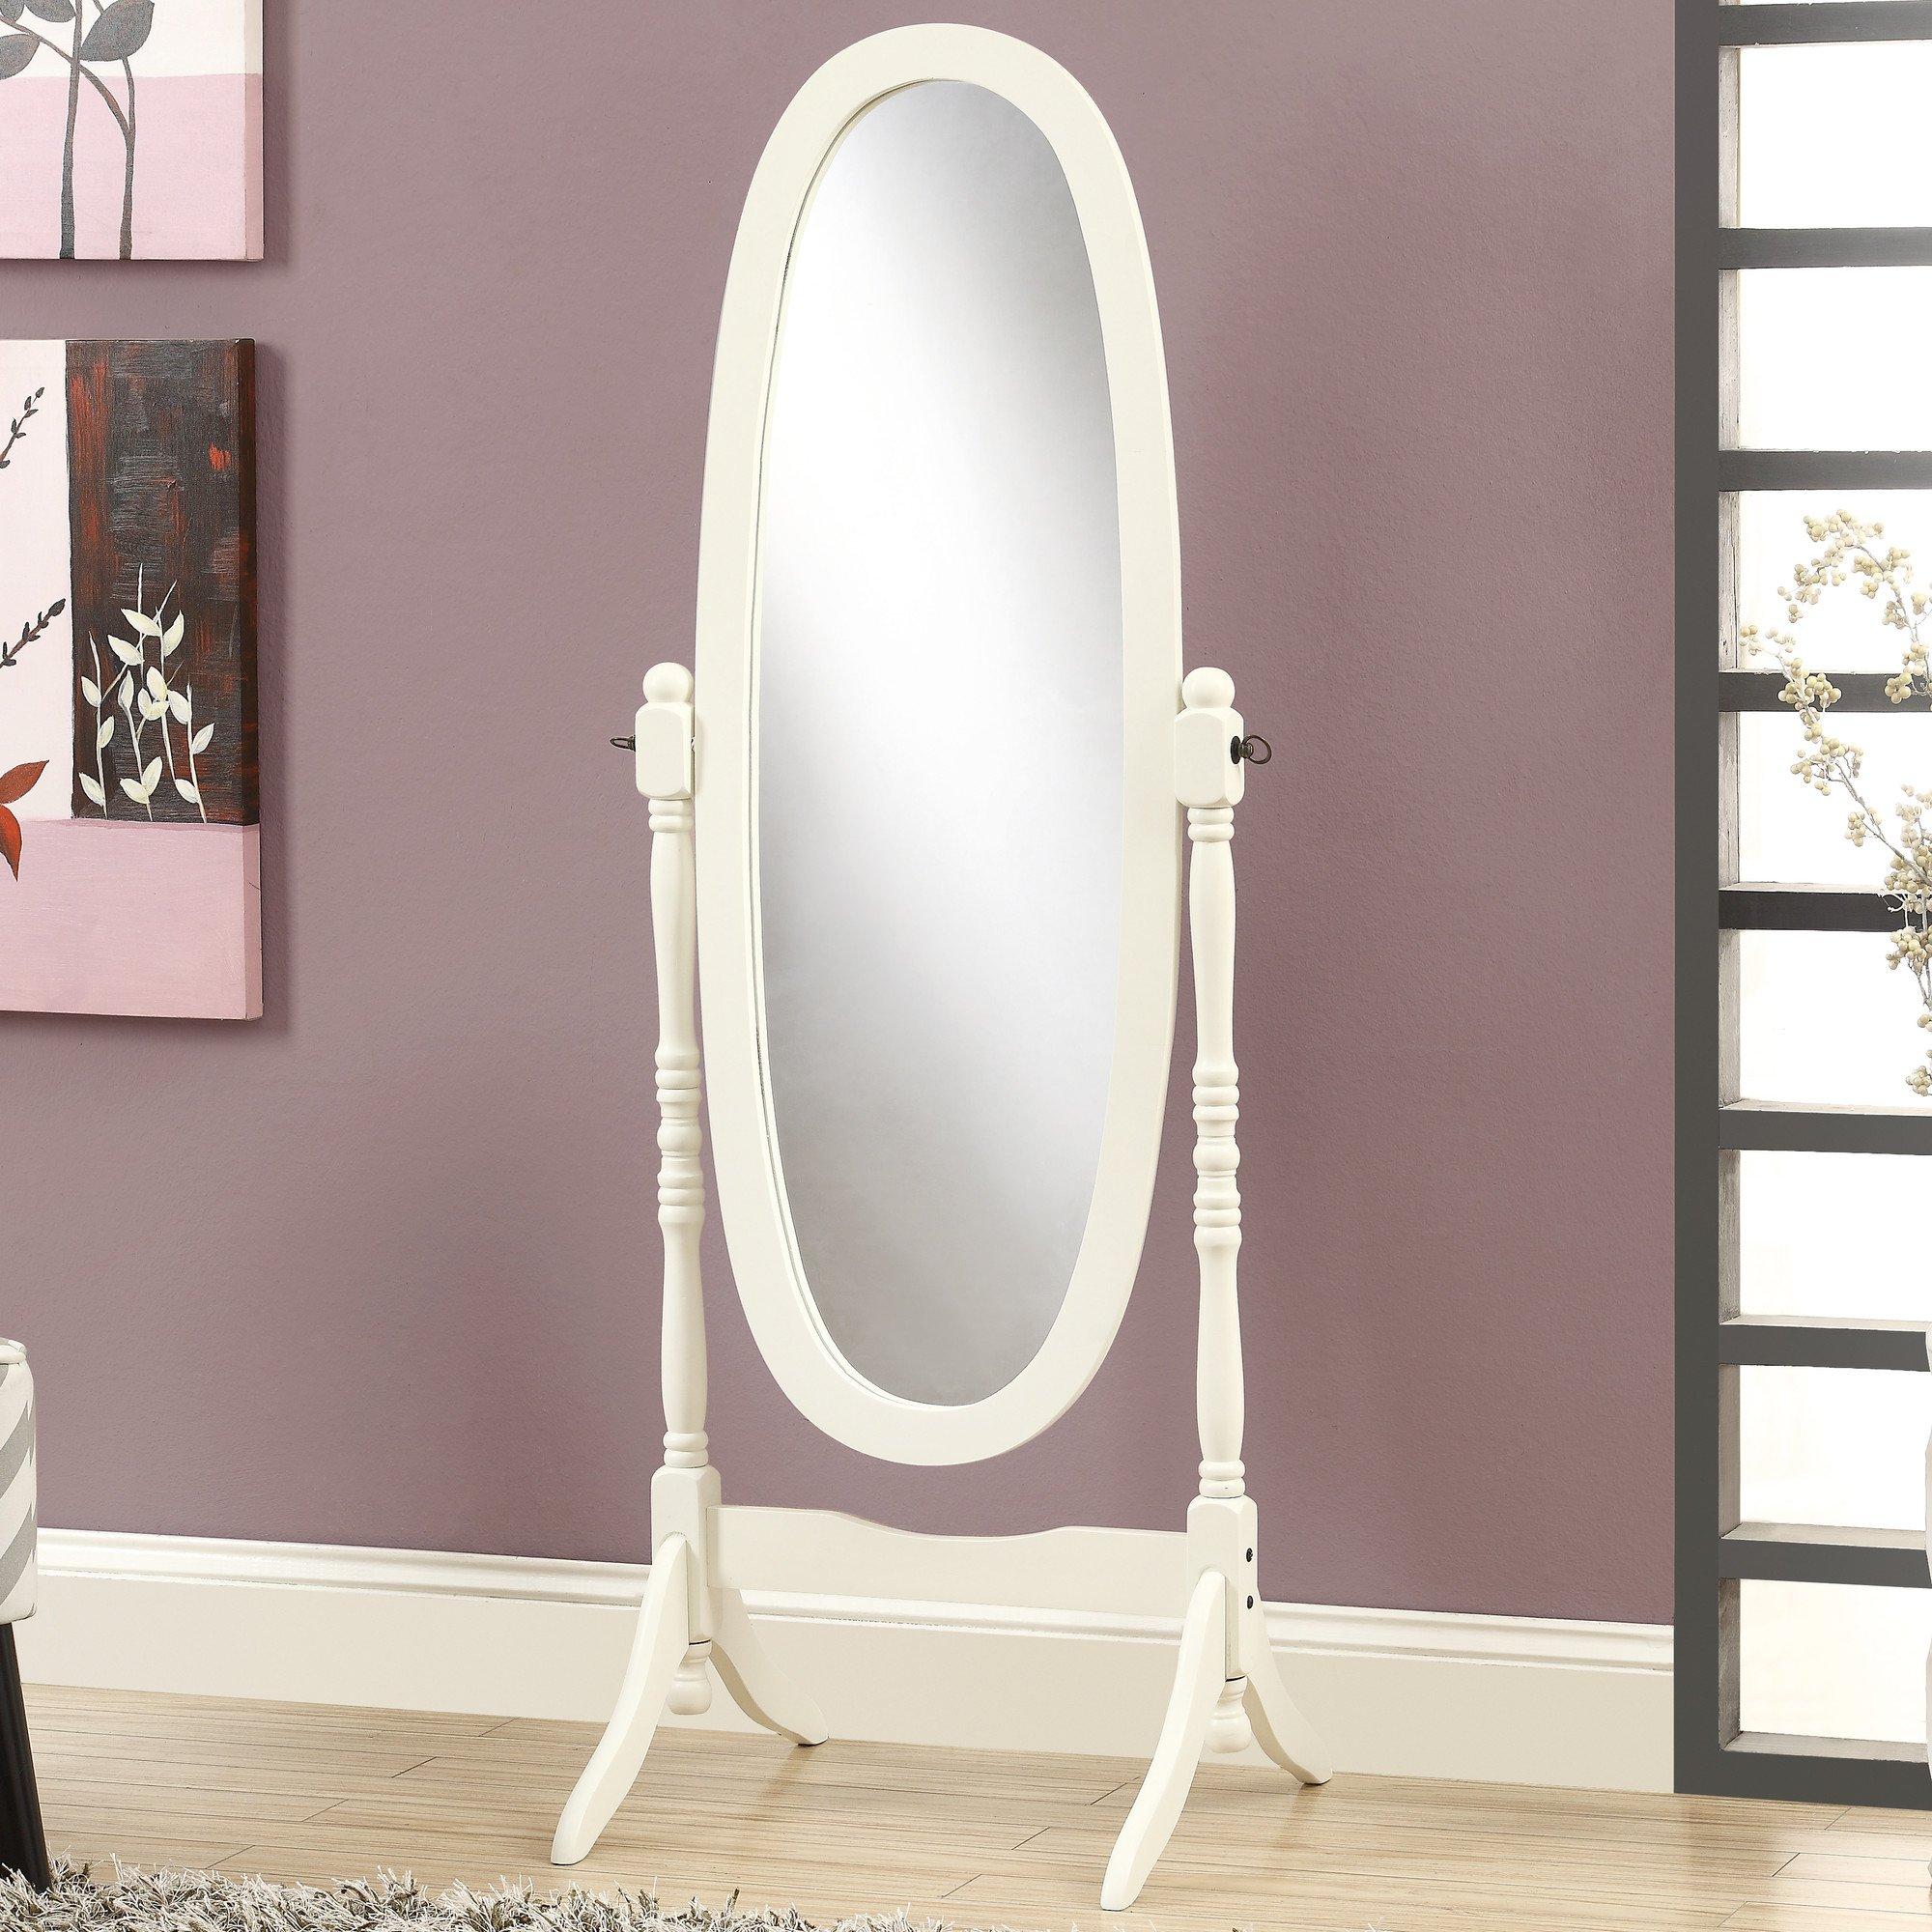 Espresso Finish Wooden Cheval Bedroom Floor Mirror (White Oval)